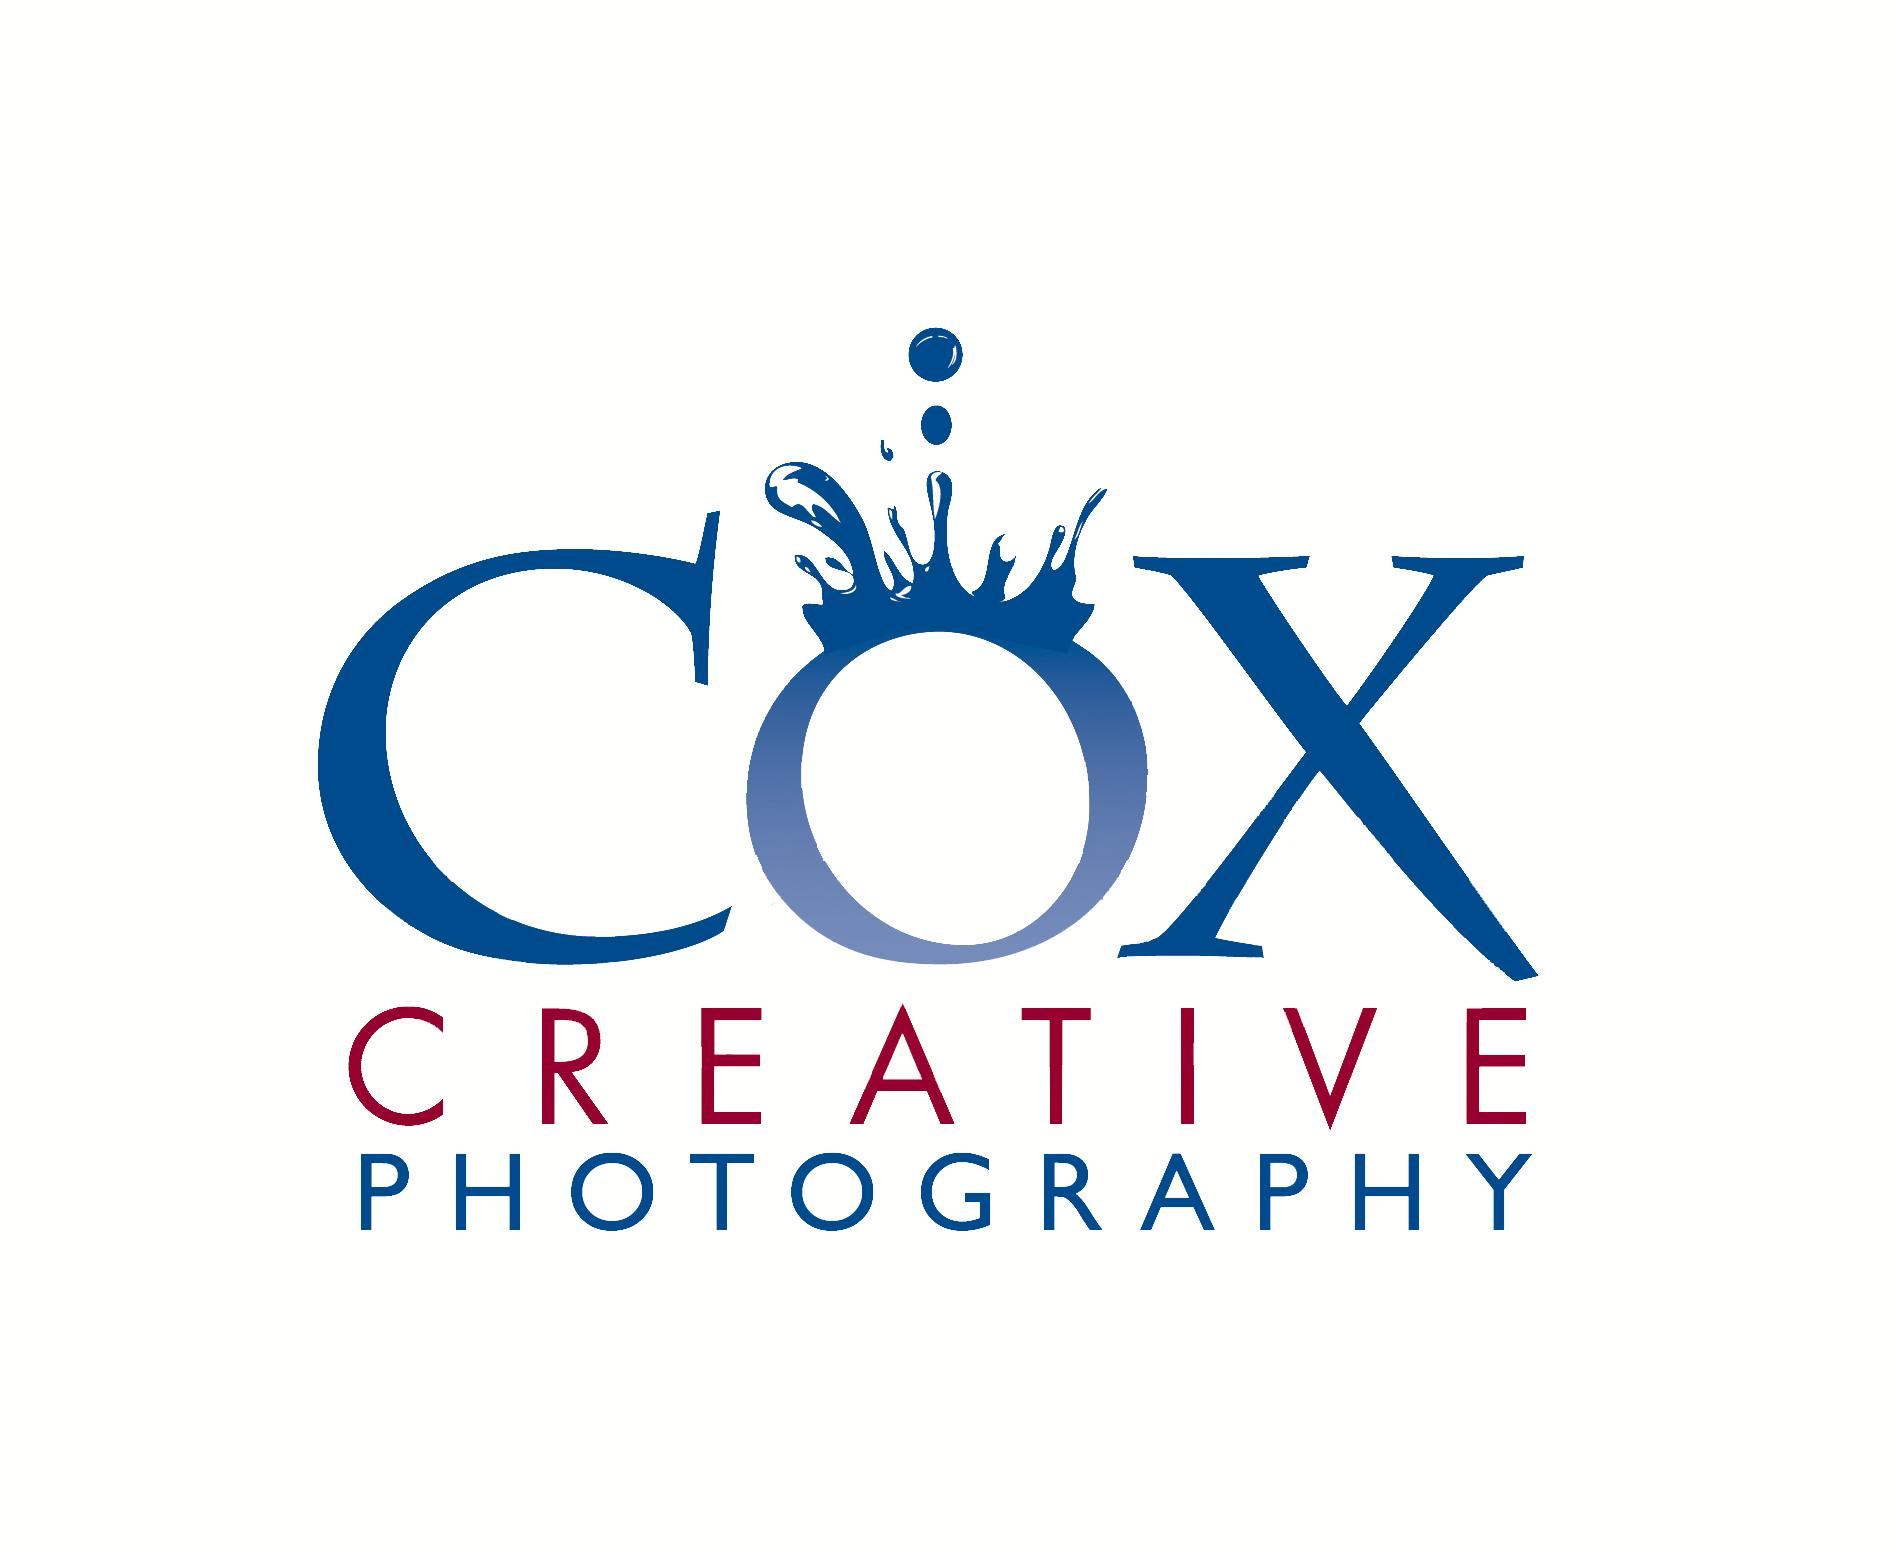 COX CREATIVE PHOTOGRAPHY